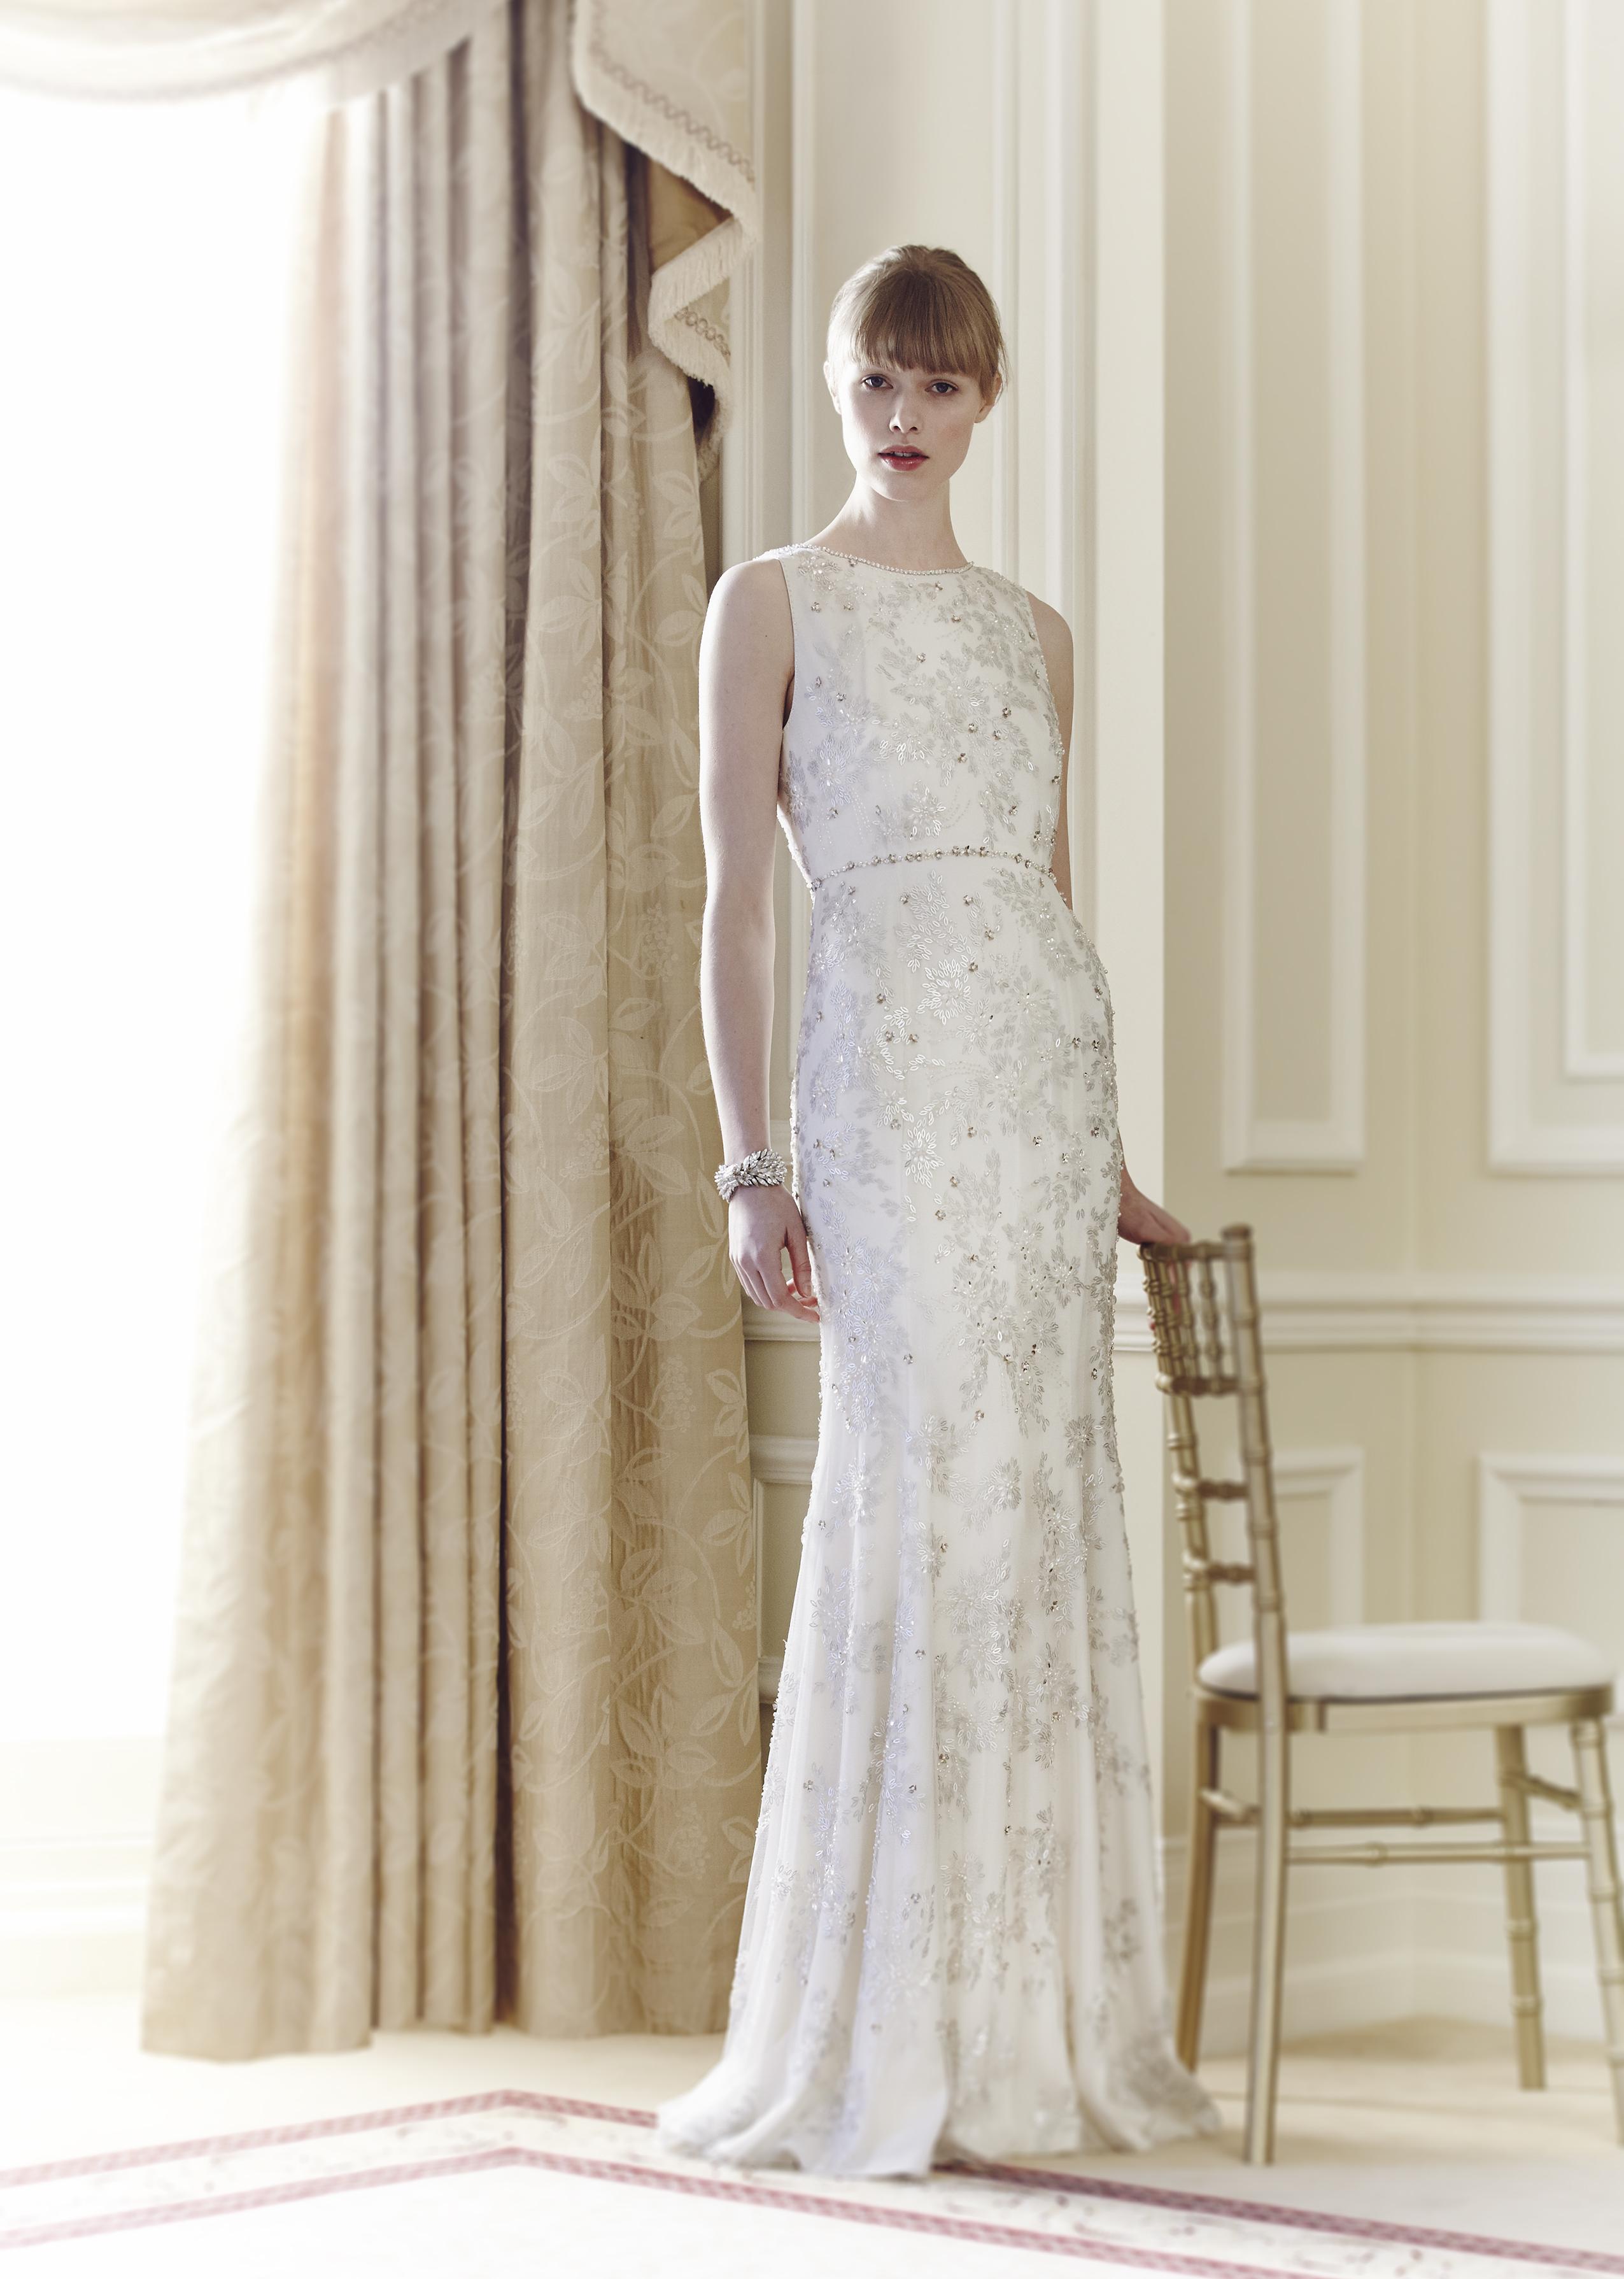 Wedding Dresses, Vintage Wedding Dresses, Hollywood Glam Wedding Dresses, Fashion, Glam Weddings, Vintage Weddings, Jenny packham, Art Deco Weddings